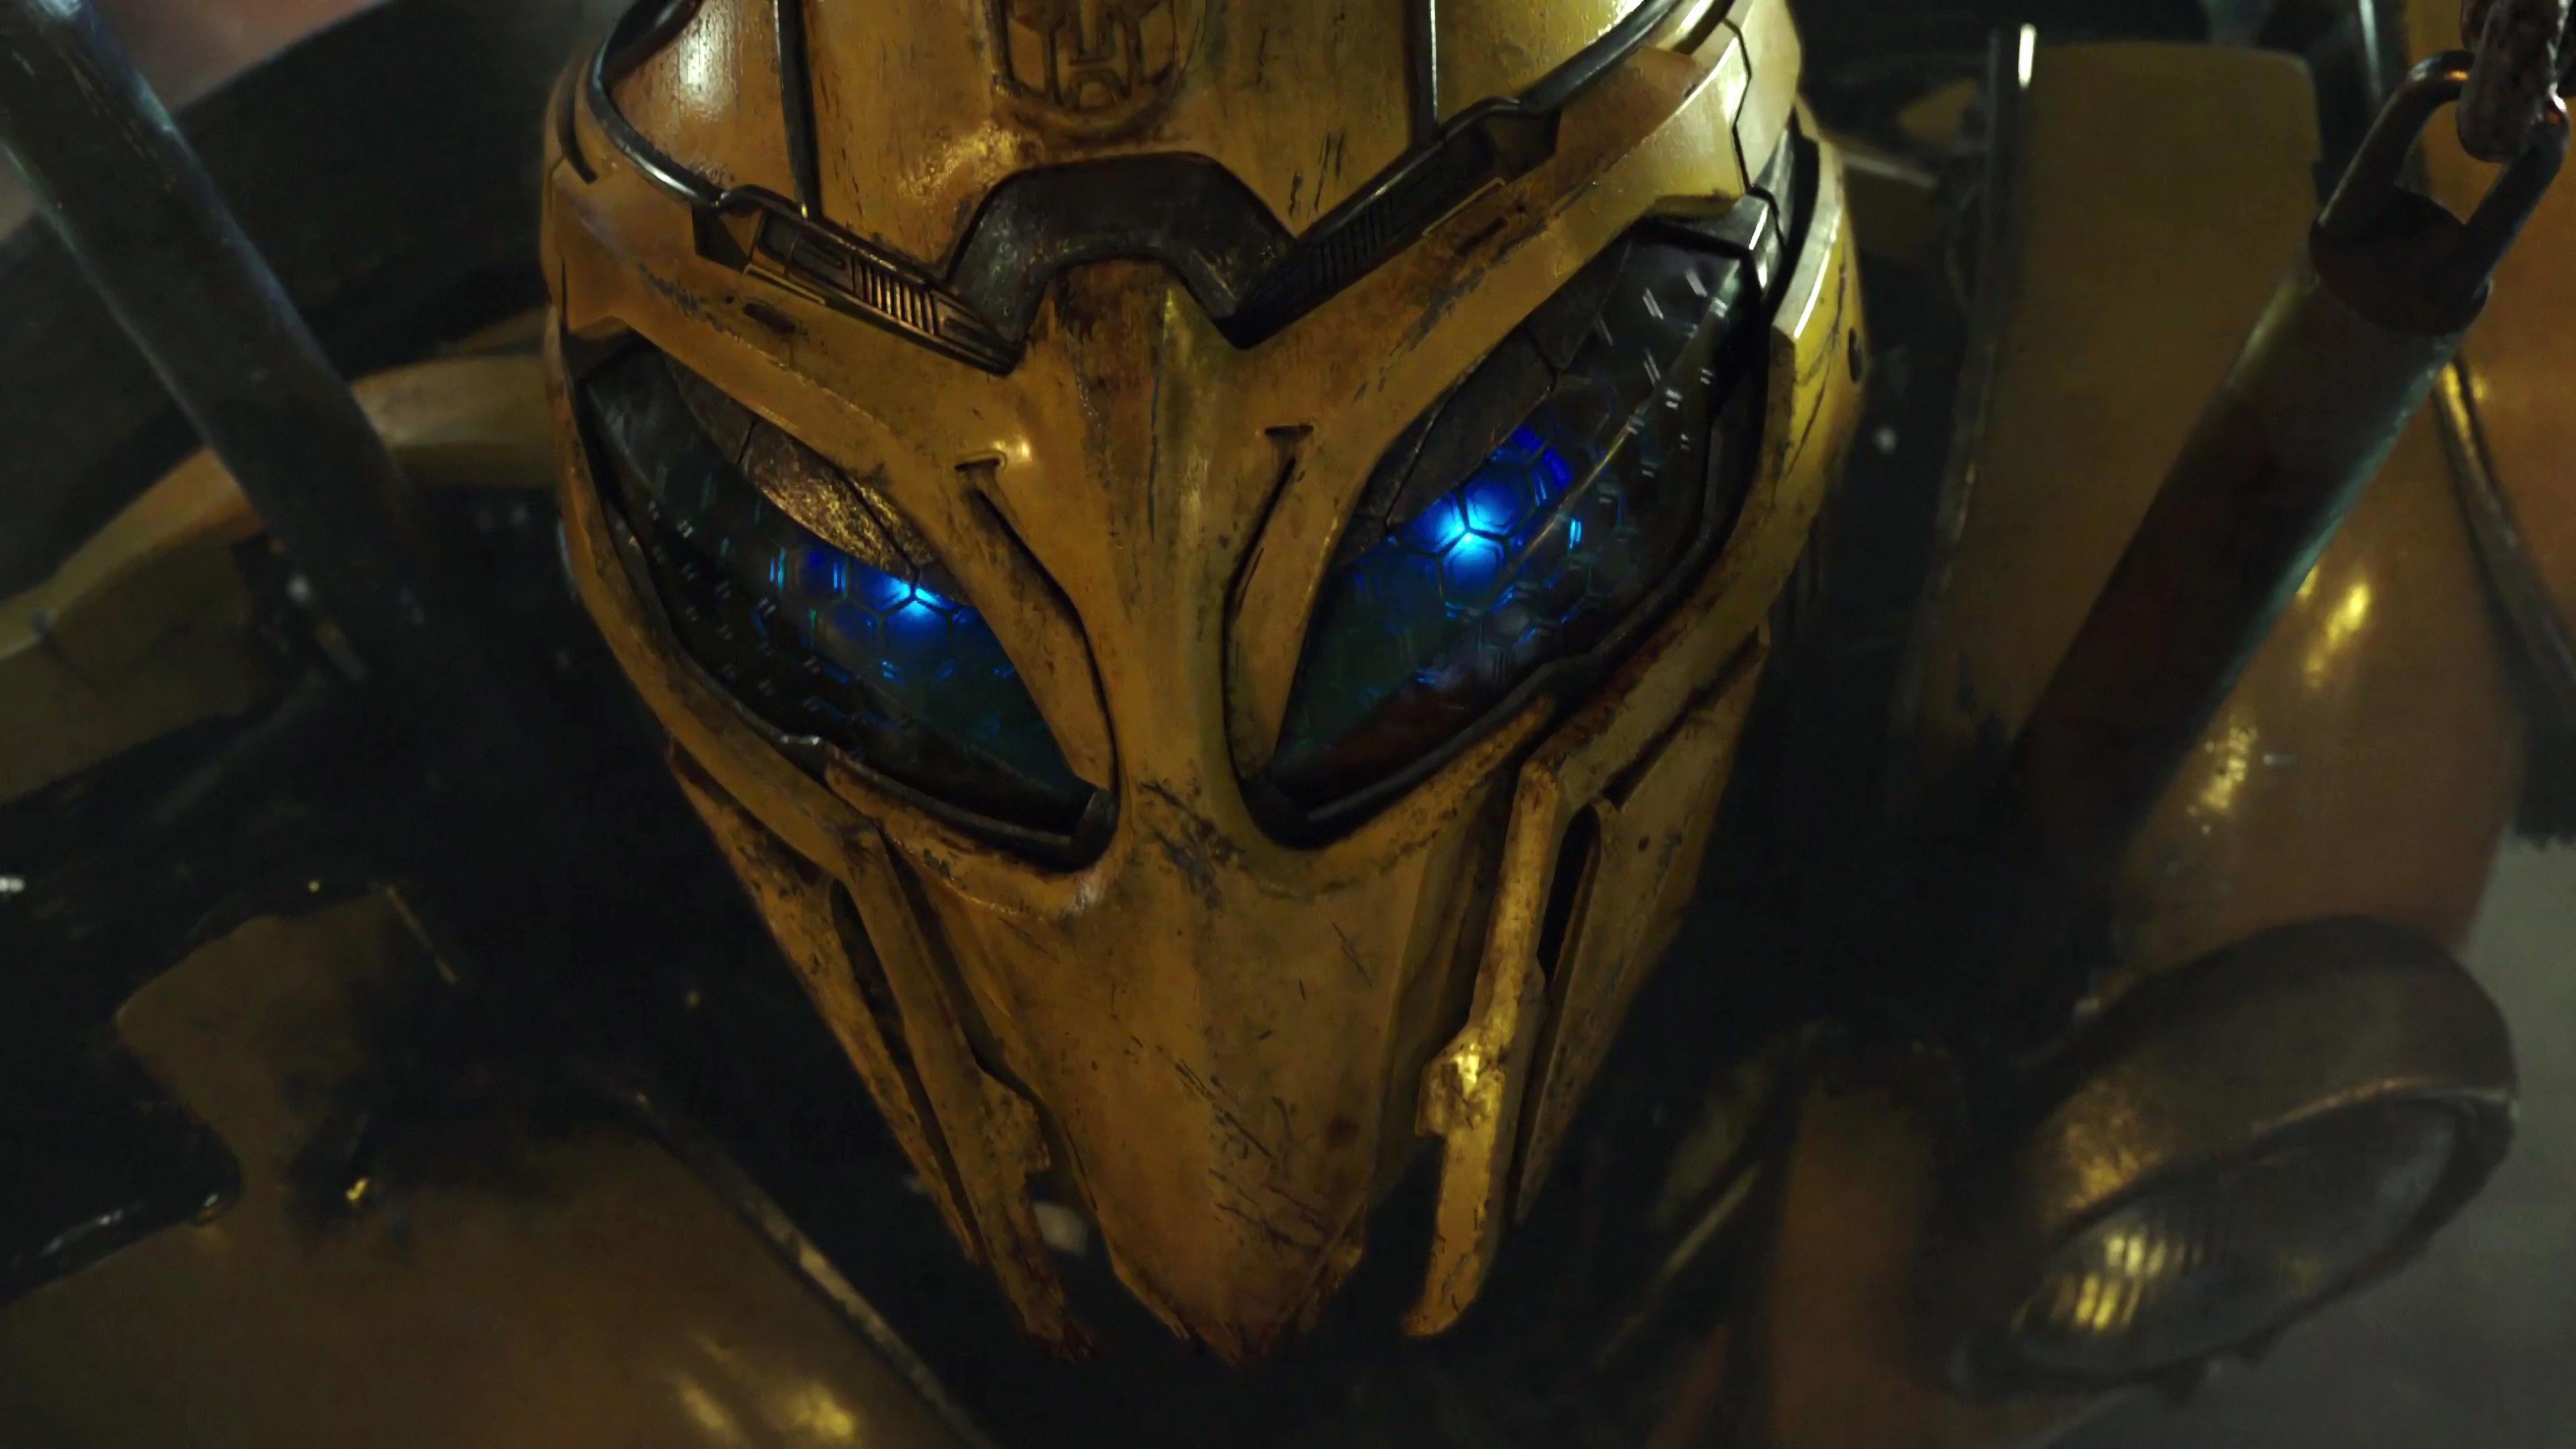 Bumblebee 2018 Movie 4k, HD Movies, 4k Wallpapers, Images ...